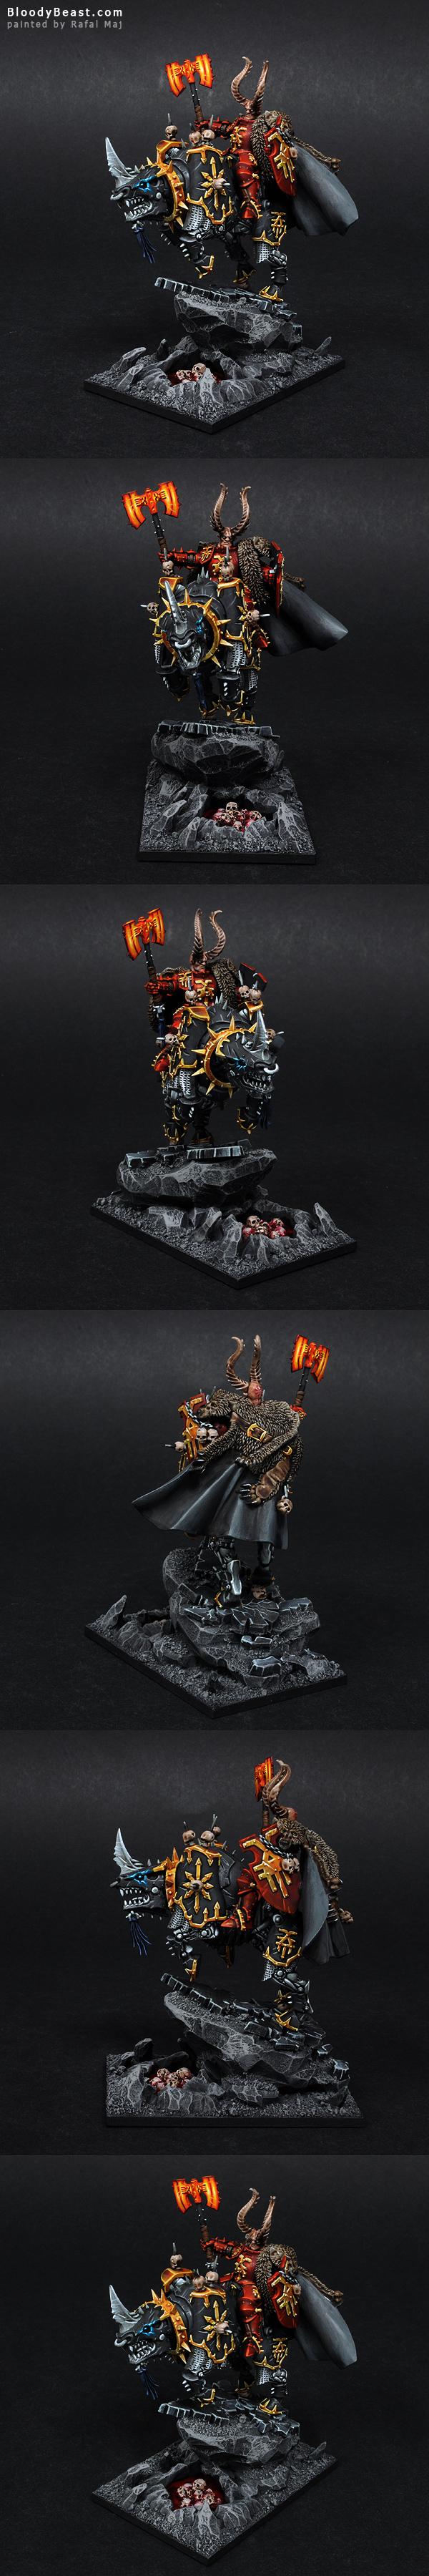 Chaos Khorne Lord on Juggernaut painted by Rafal Maj (BloodyBeast.com)